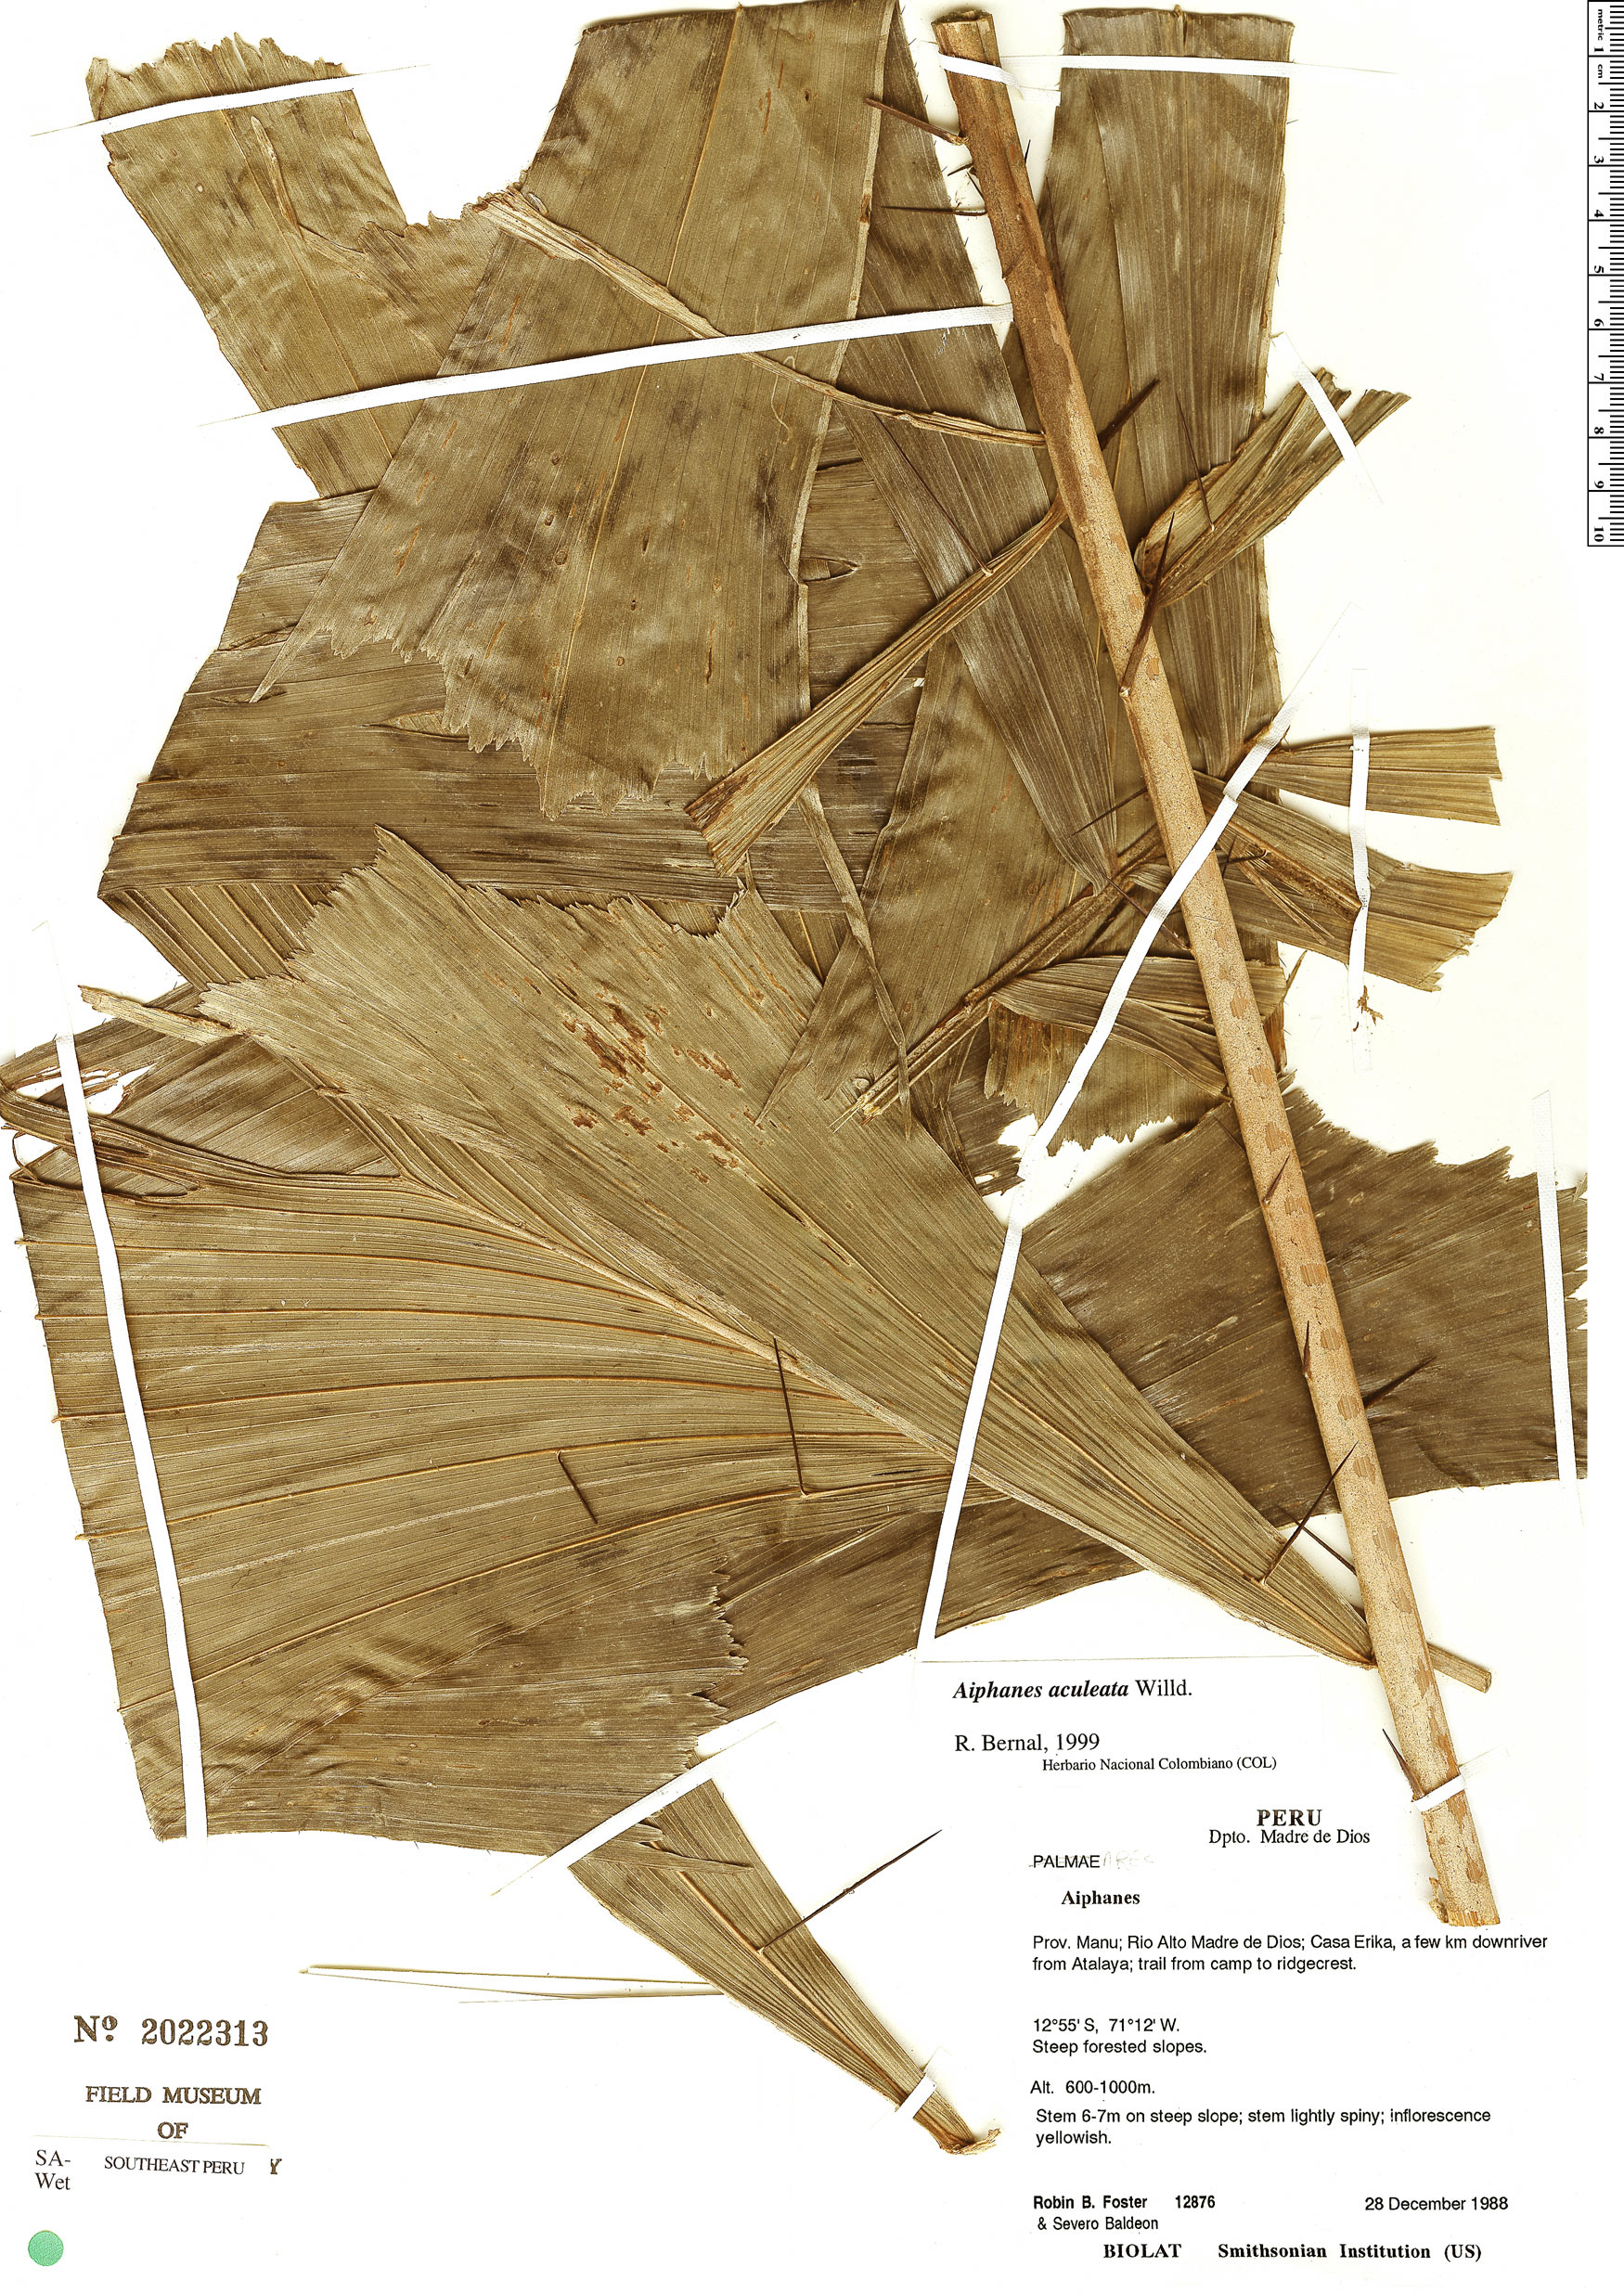 Specimen: Aiphanes aculeata